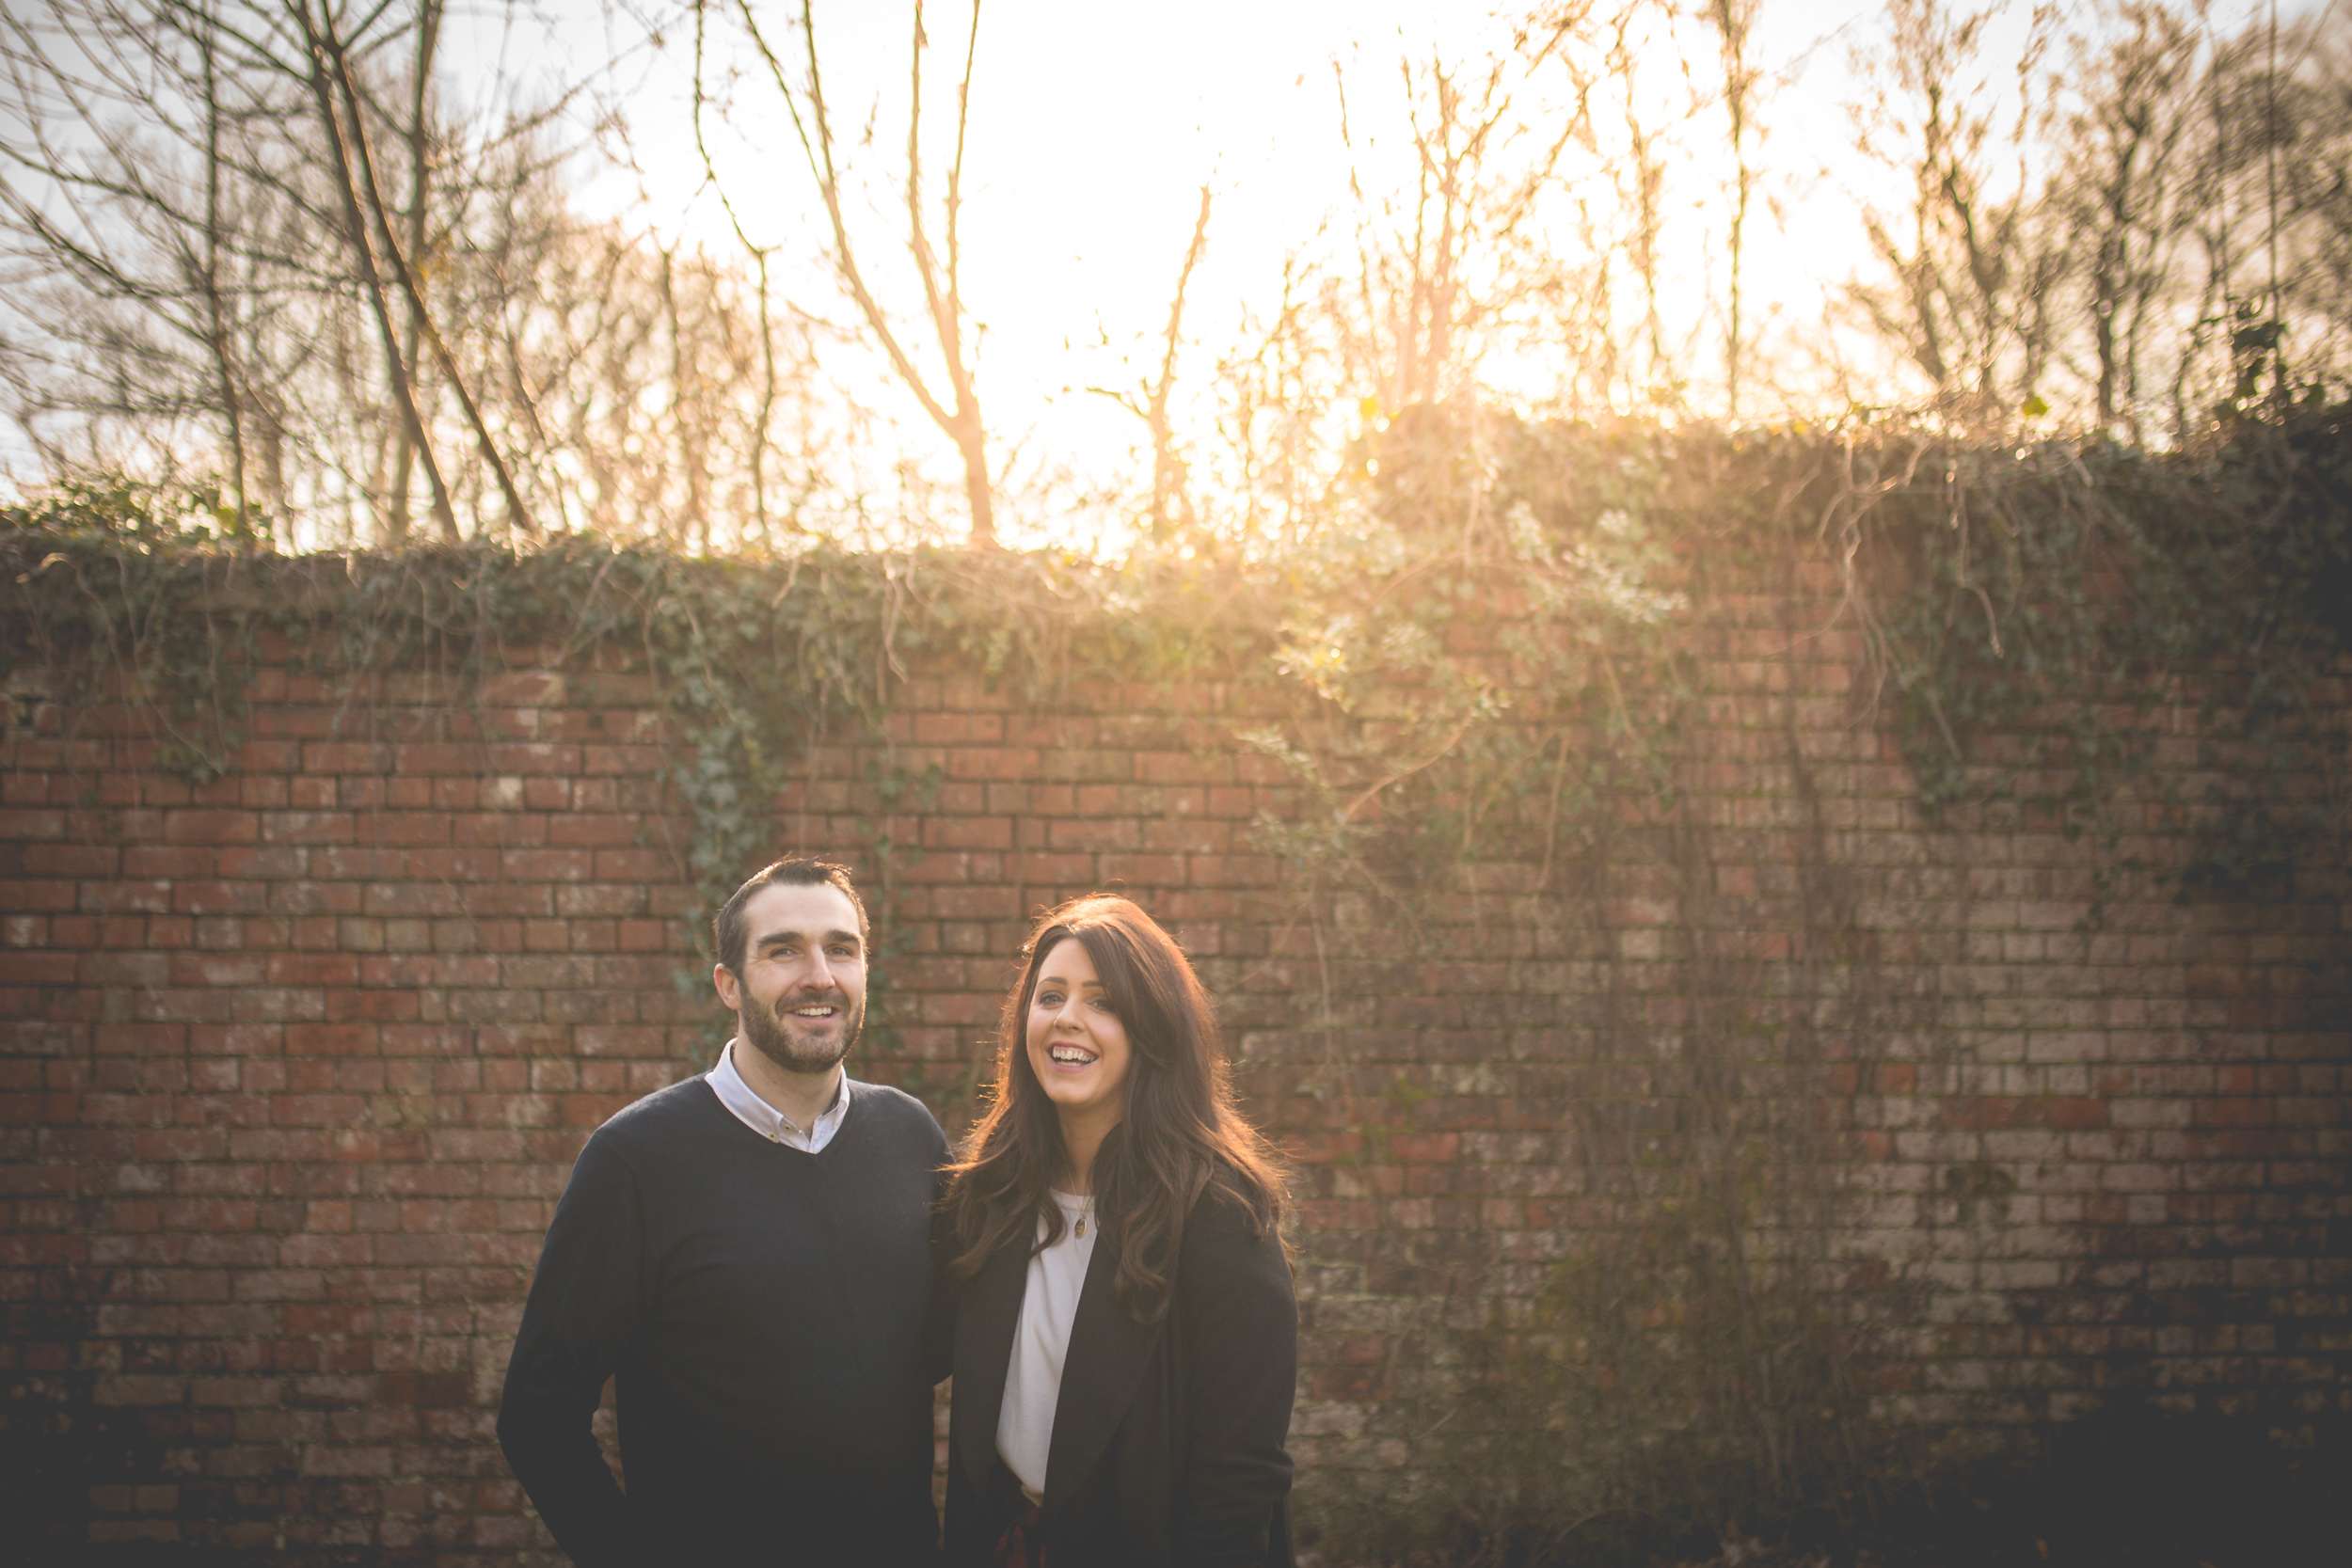 Oonagh & Francis Engagement-6.jpg